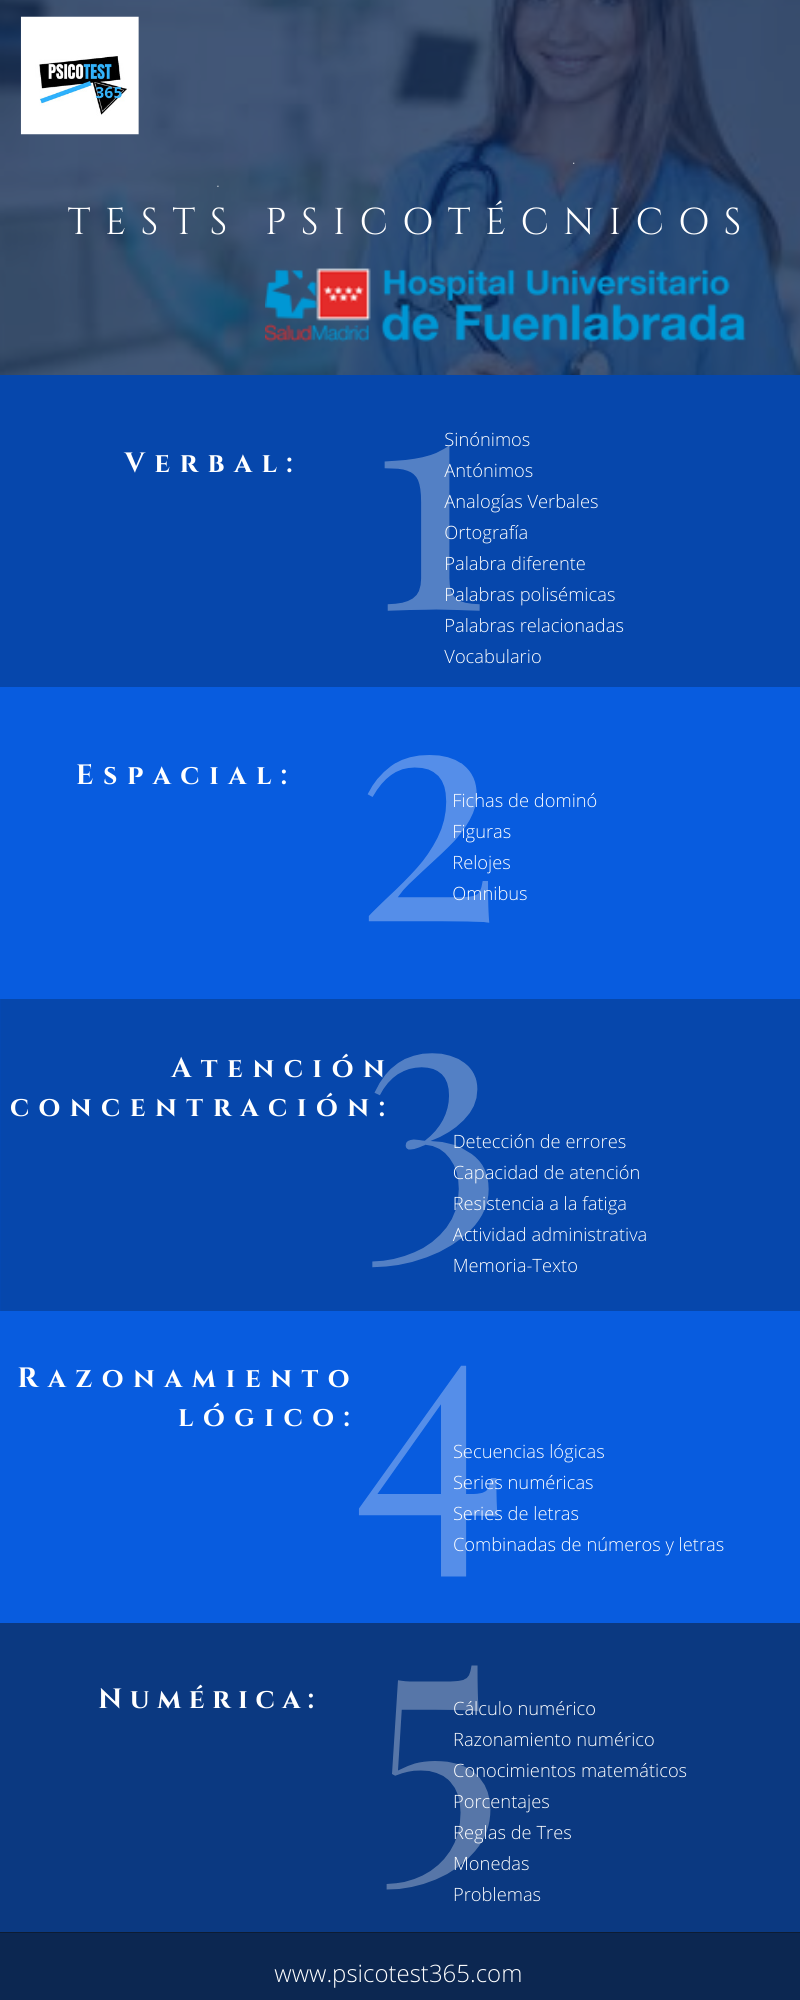 infografía psicotécnicos hospital fuenlabrada